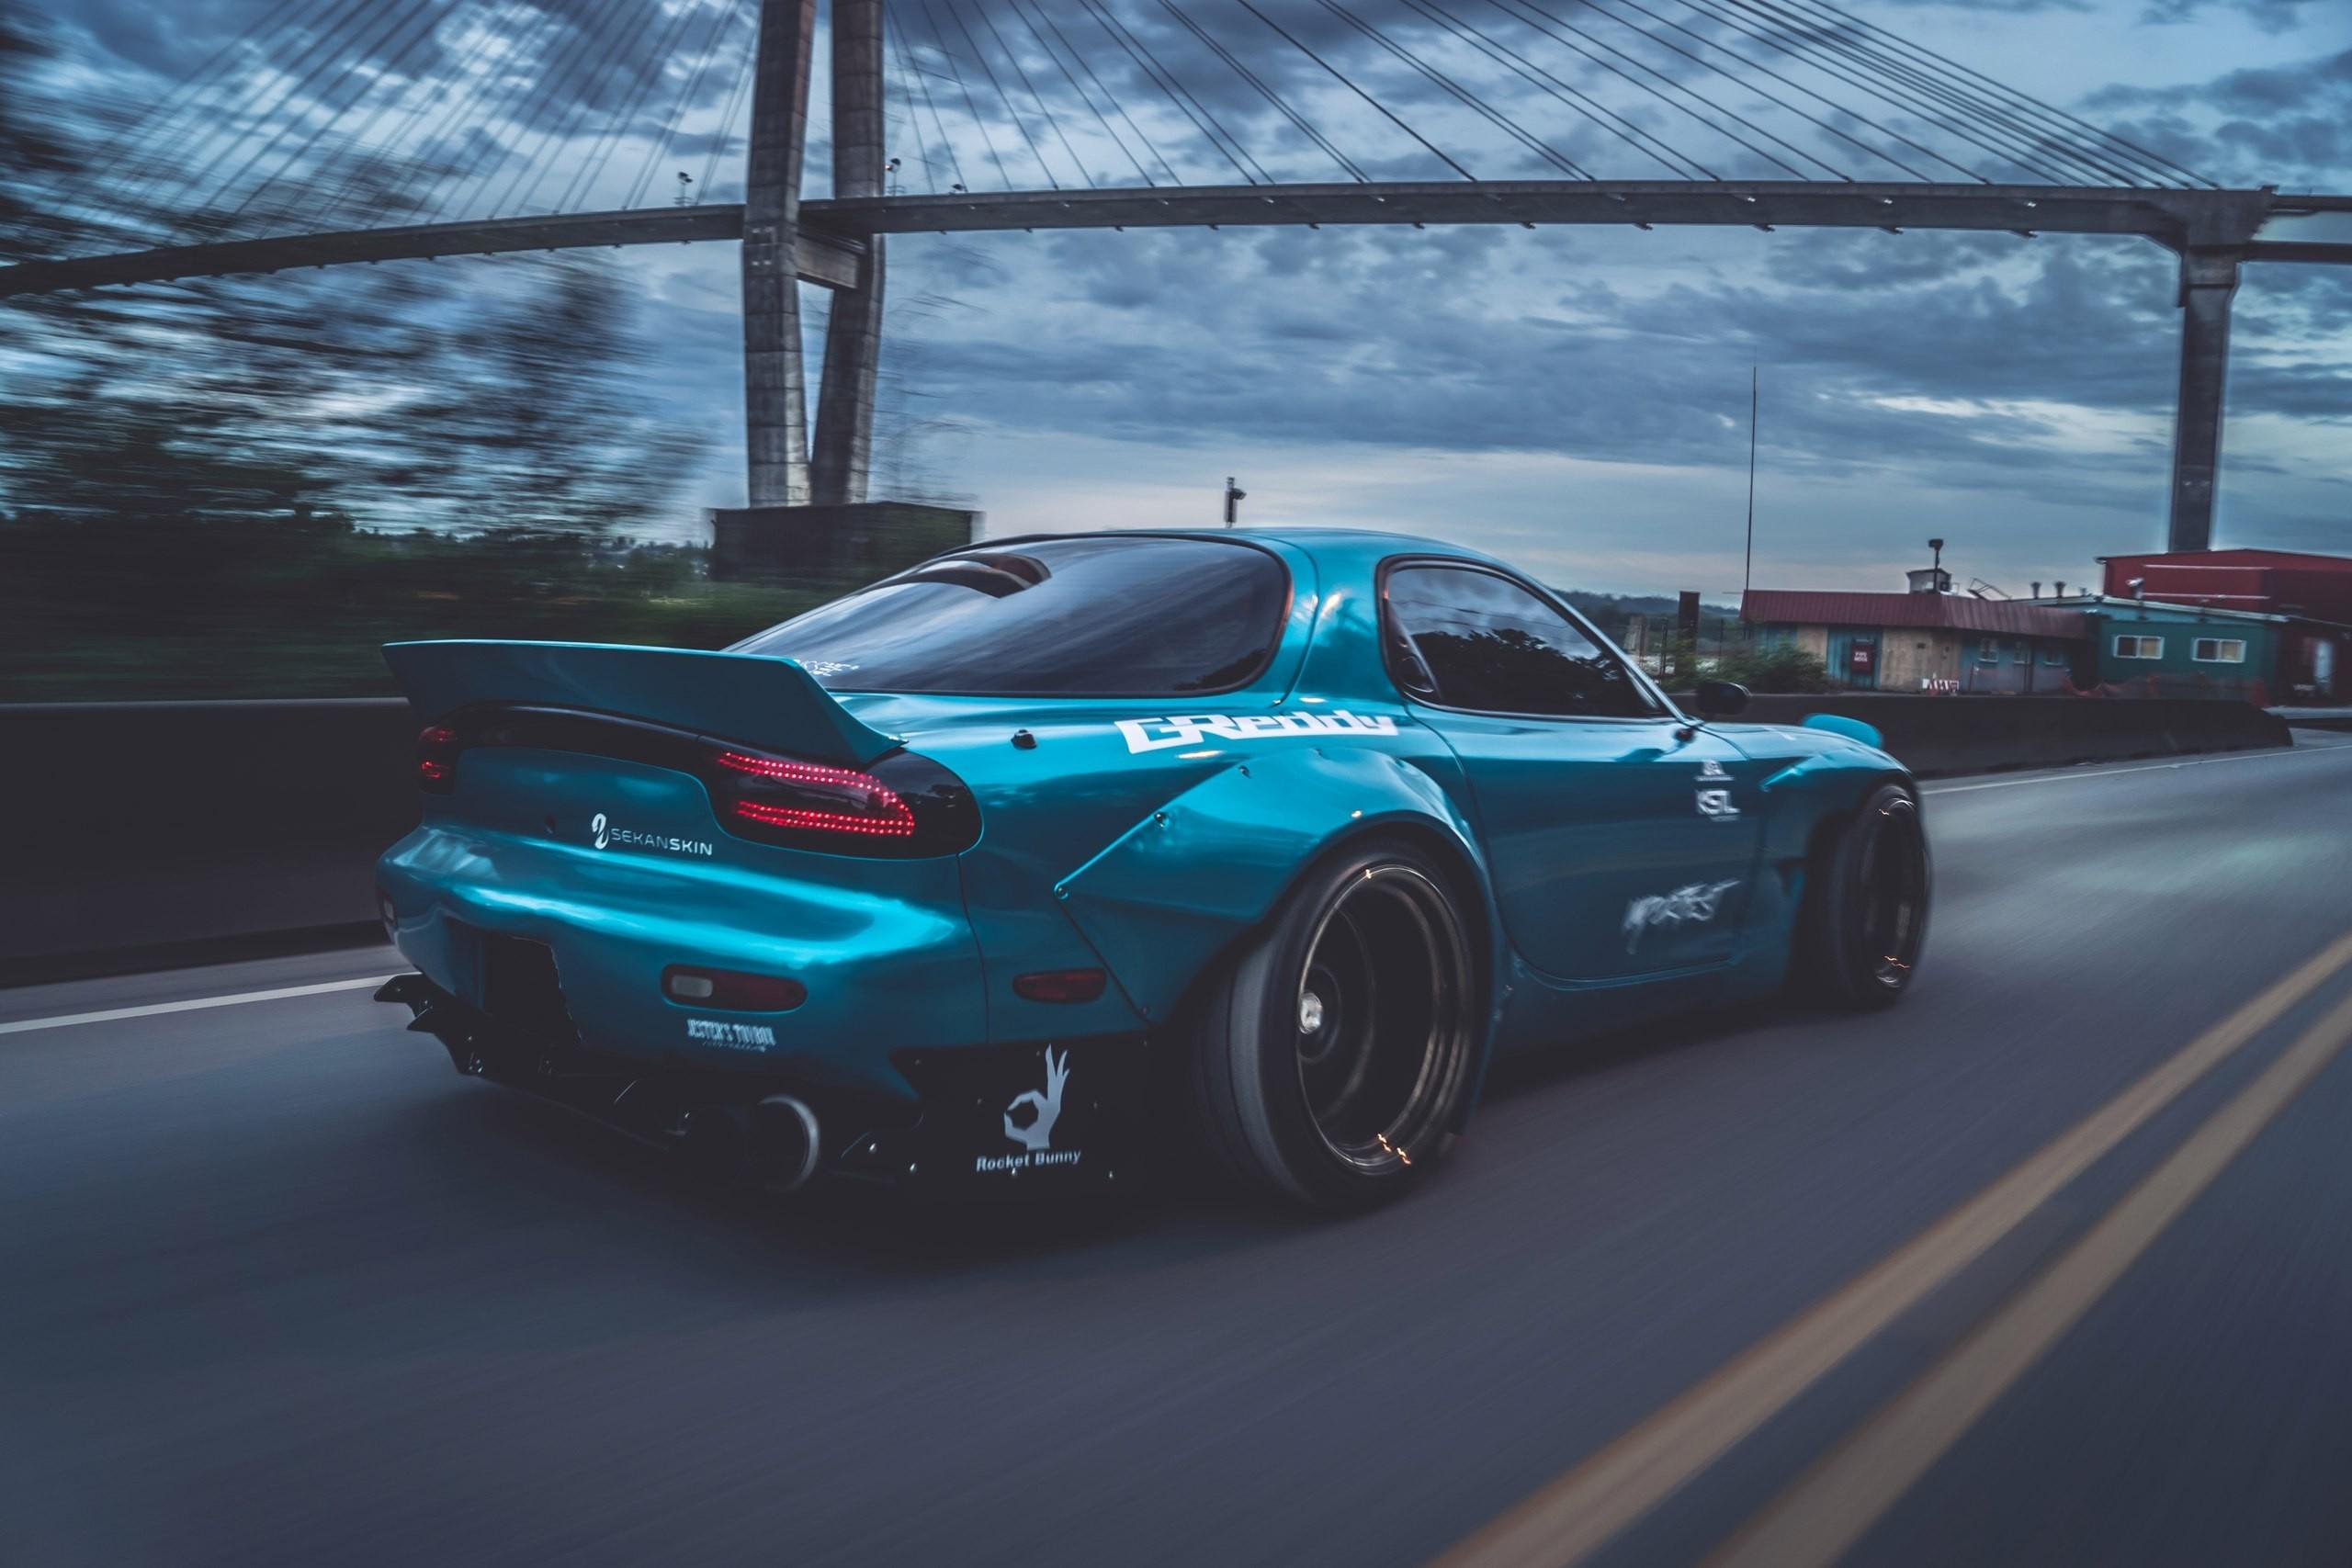 sports car Mazda RX-7 Mazda blue cars bridge Rocket Bunny